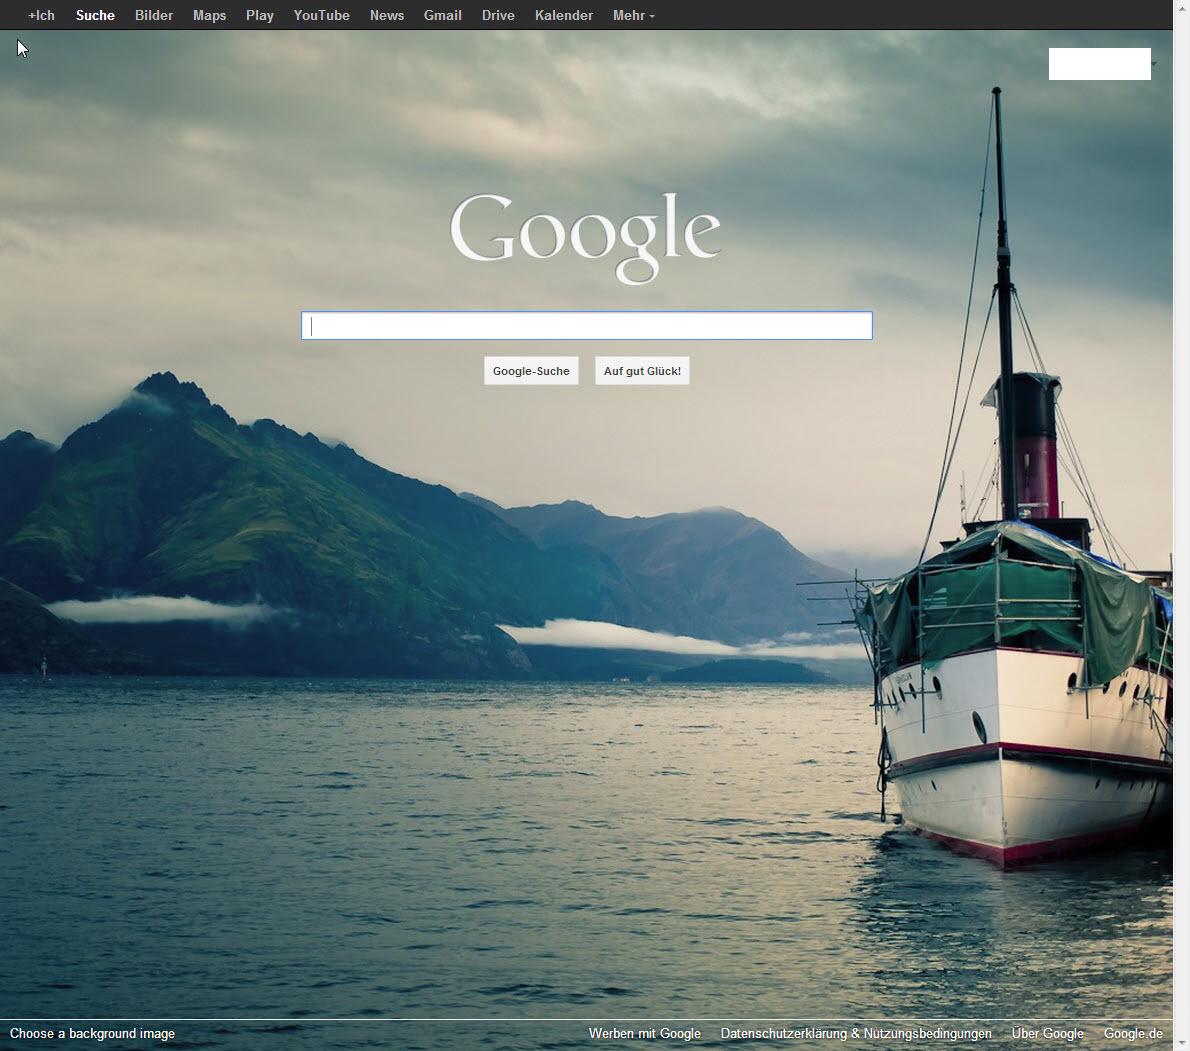 Get your Google homepage background image back   gHacks 1190x1051